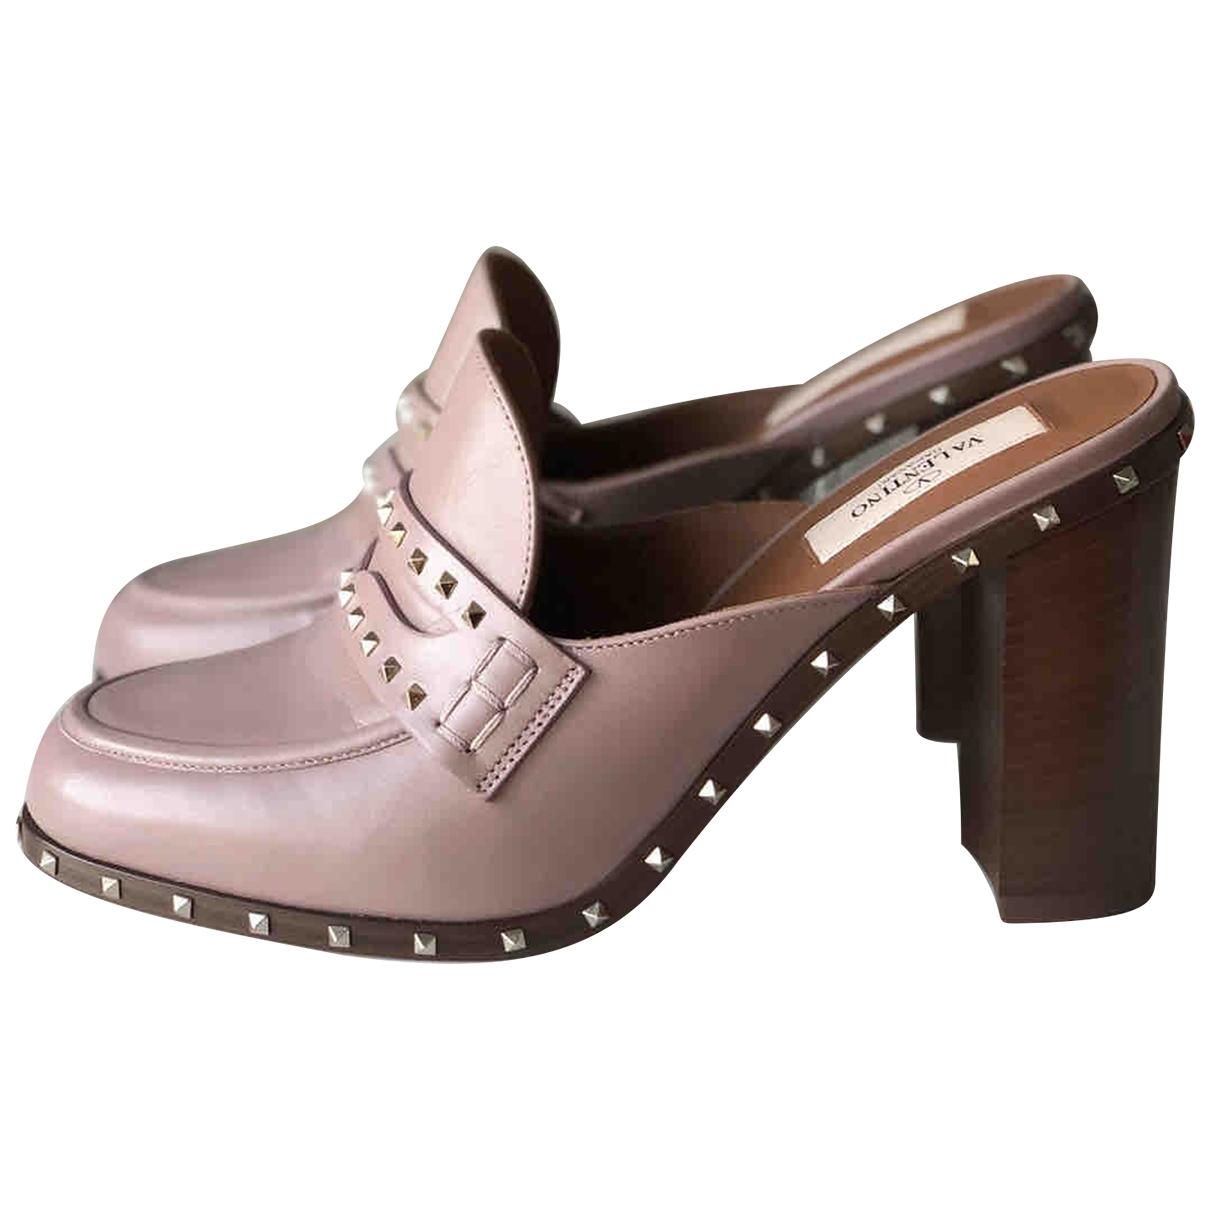 Valentino Garavani \N Pink Leather Flats for Women 37.5 EU